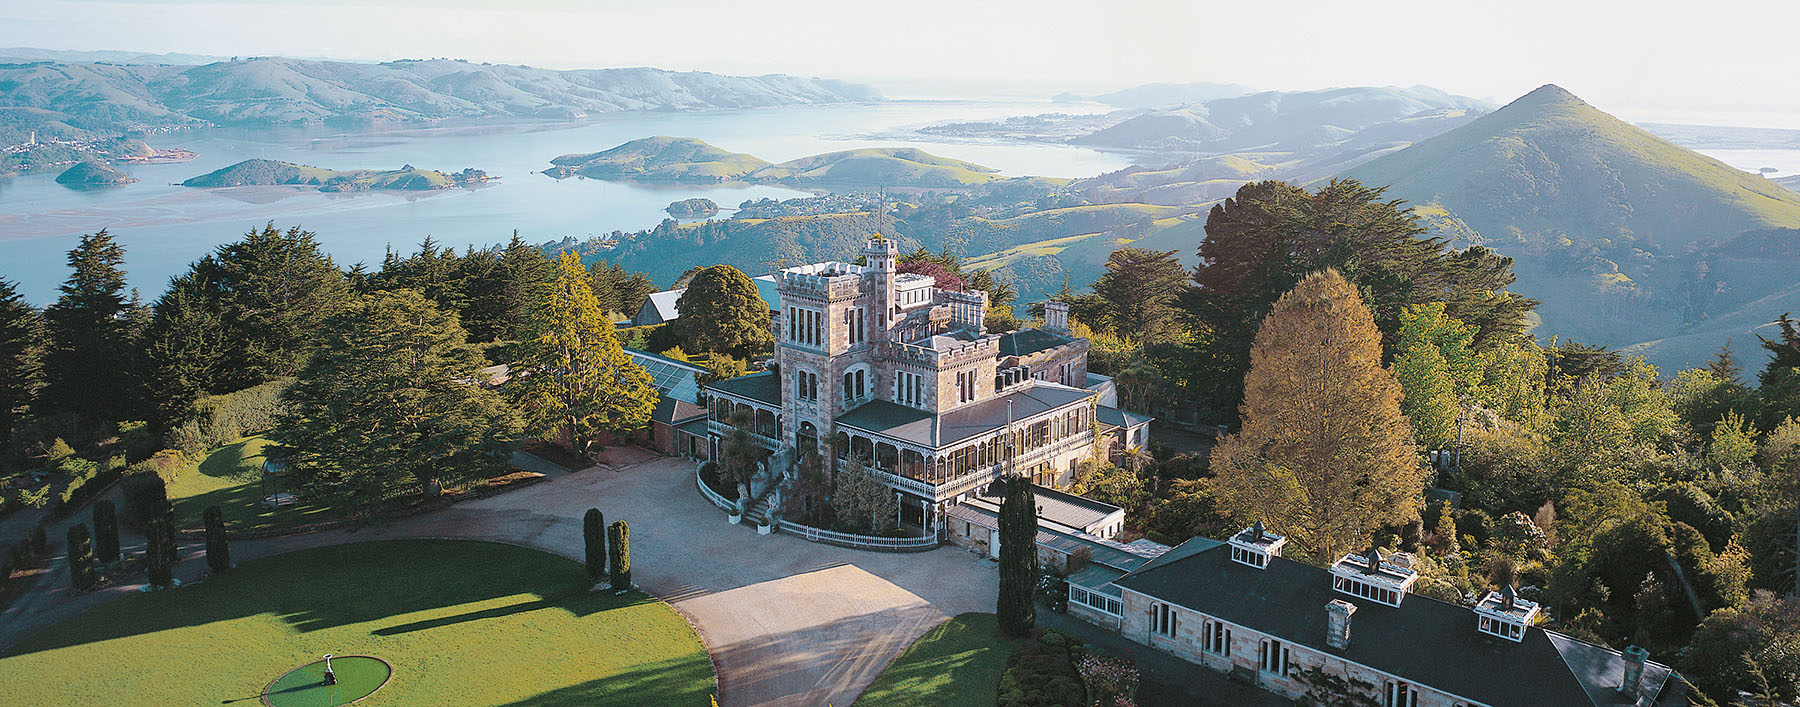 History, wildlife, gardens and castles – A Dunedin and Otago Peninsular road trip